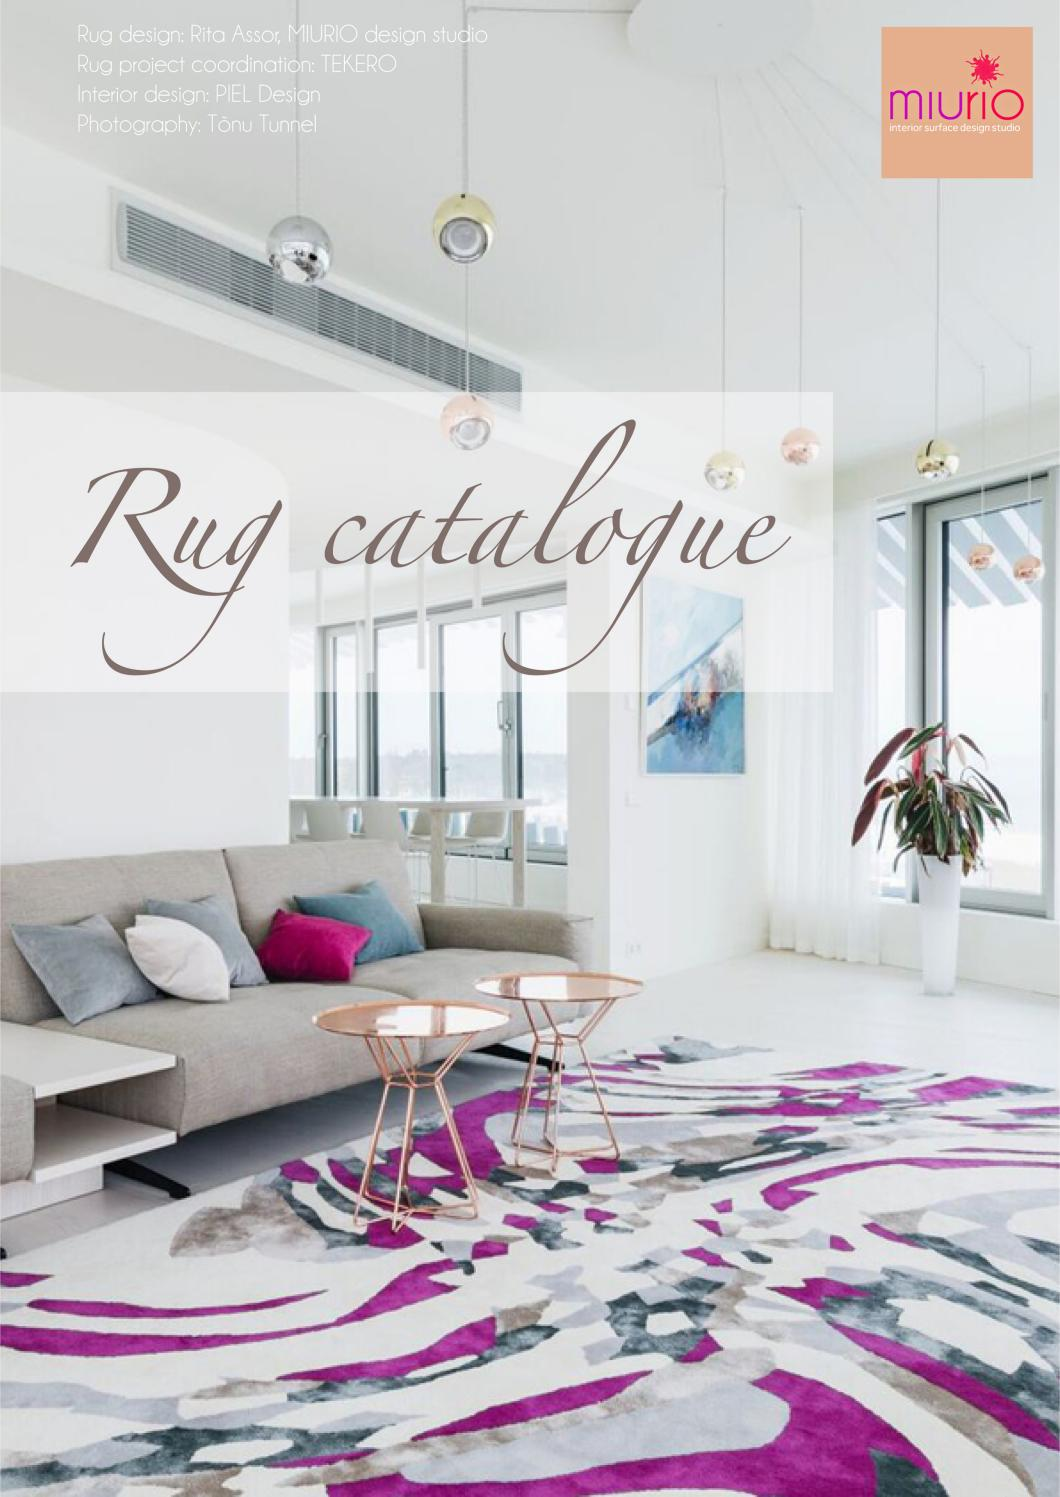 Rug Catalogue By Miurio Decor Issuu